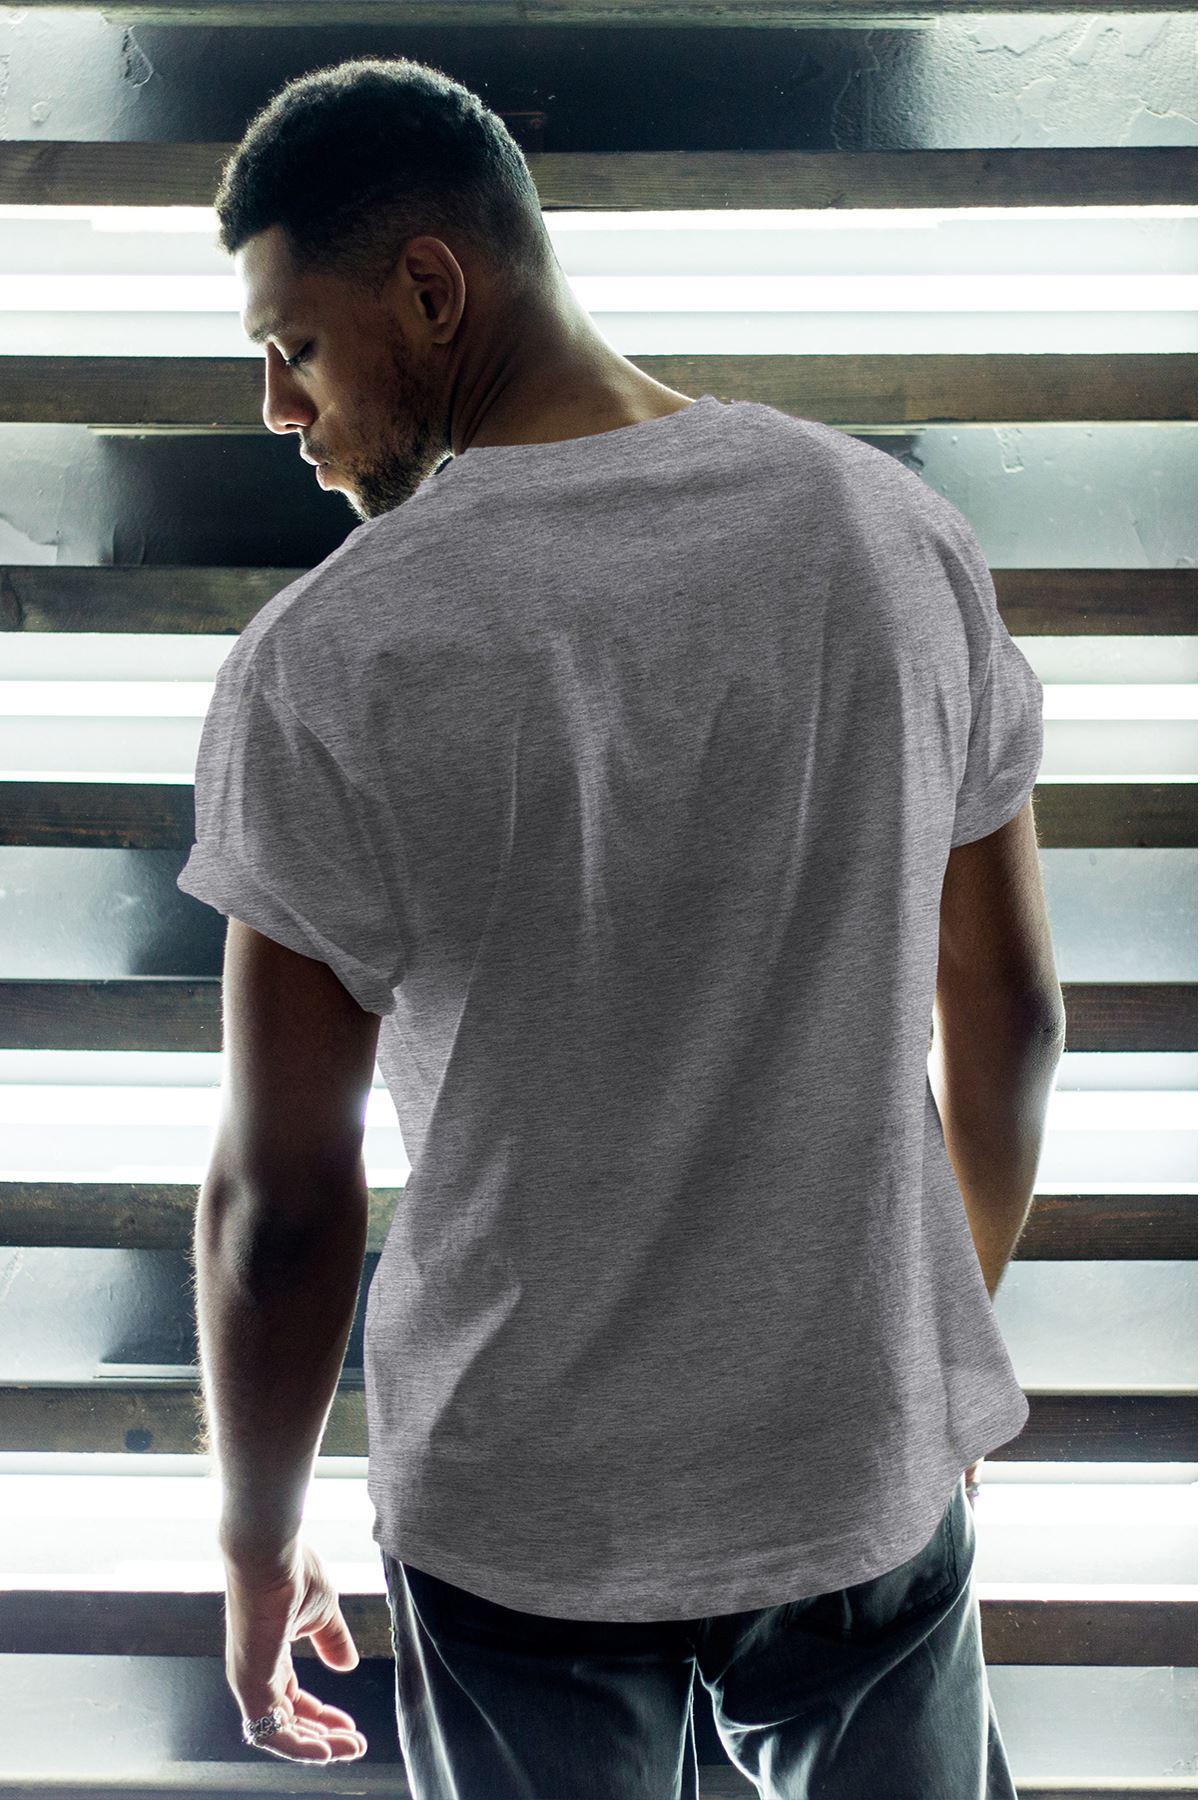 Clippers 164 Gri Erkek Oversize Tshirt - Tişört